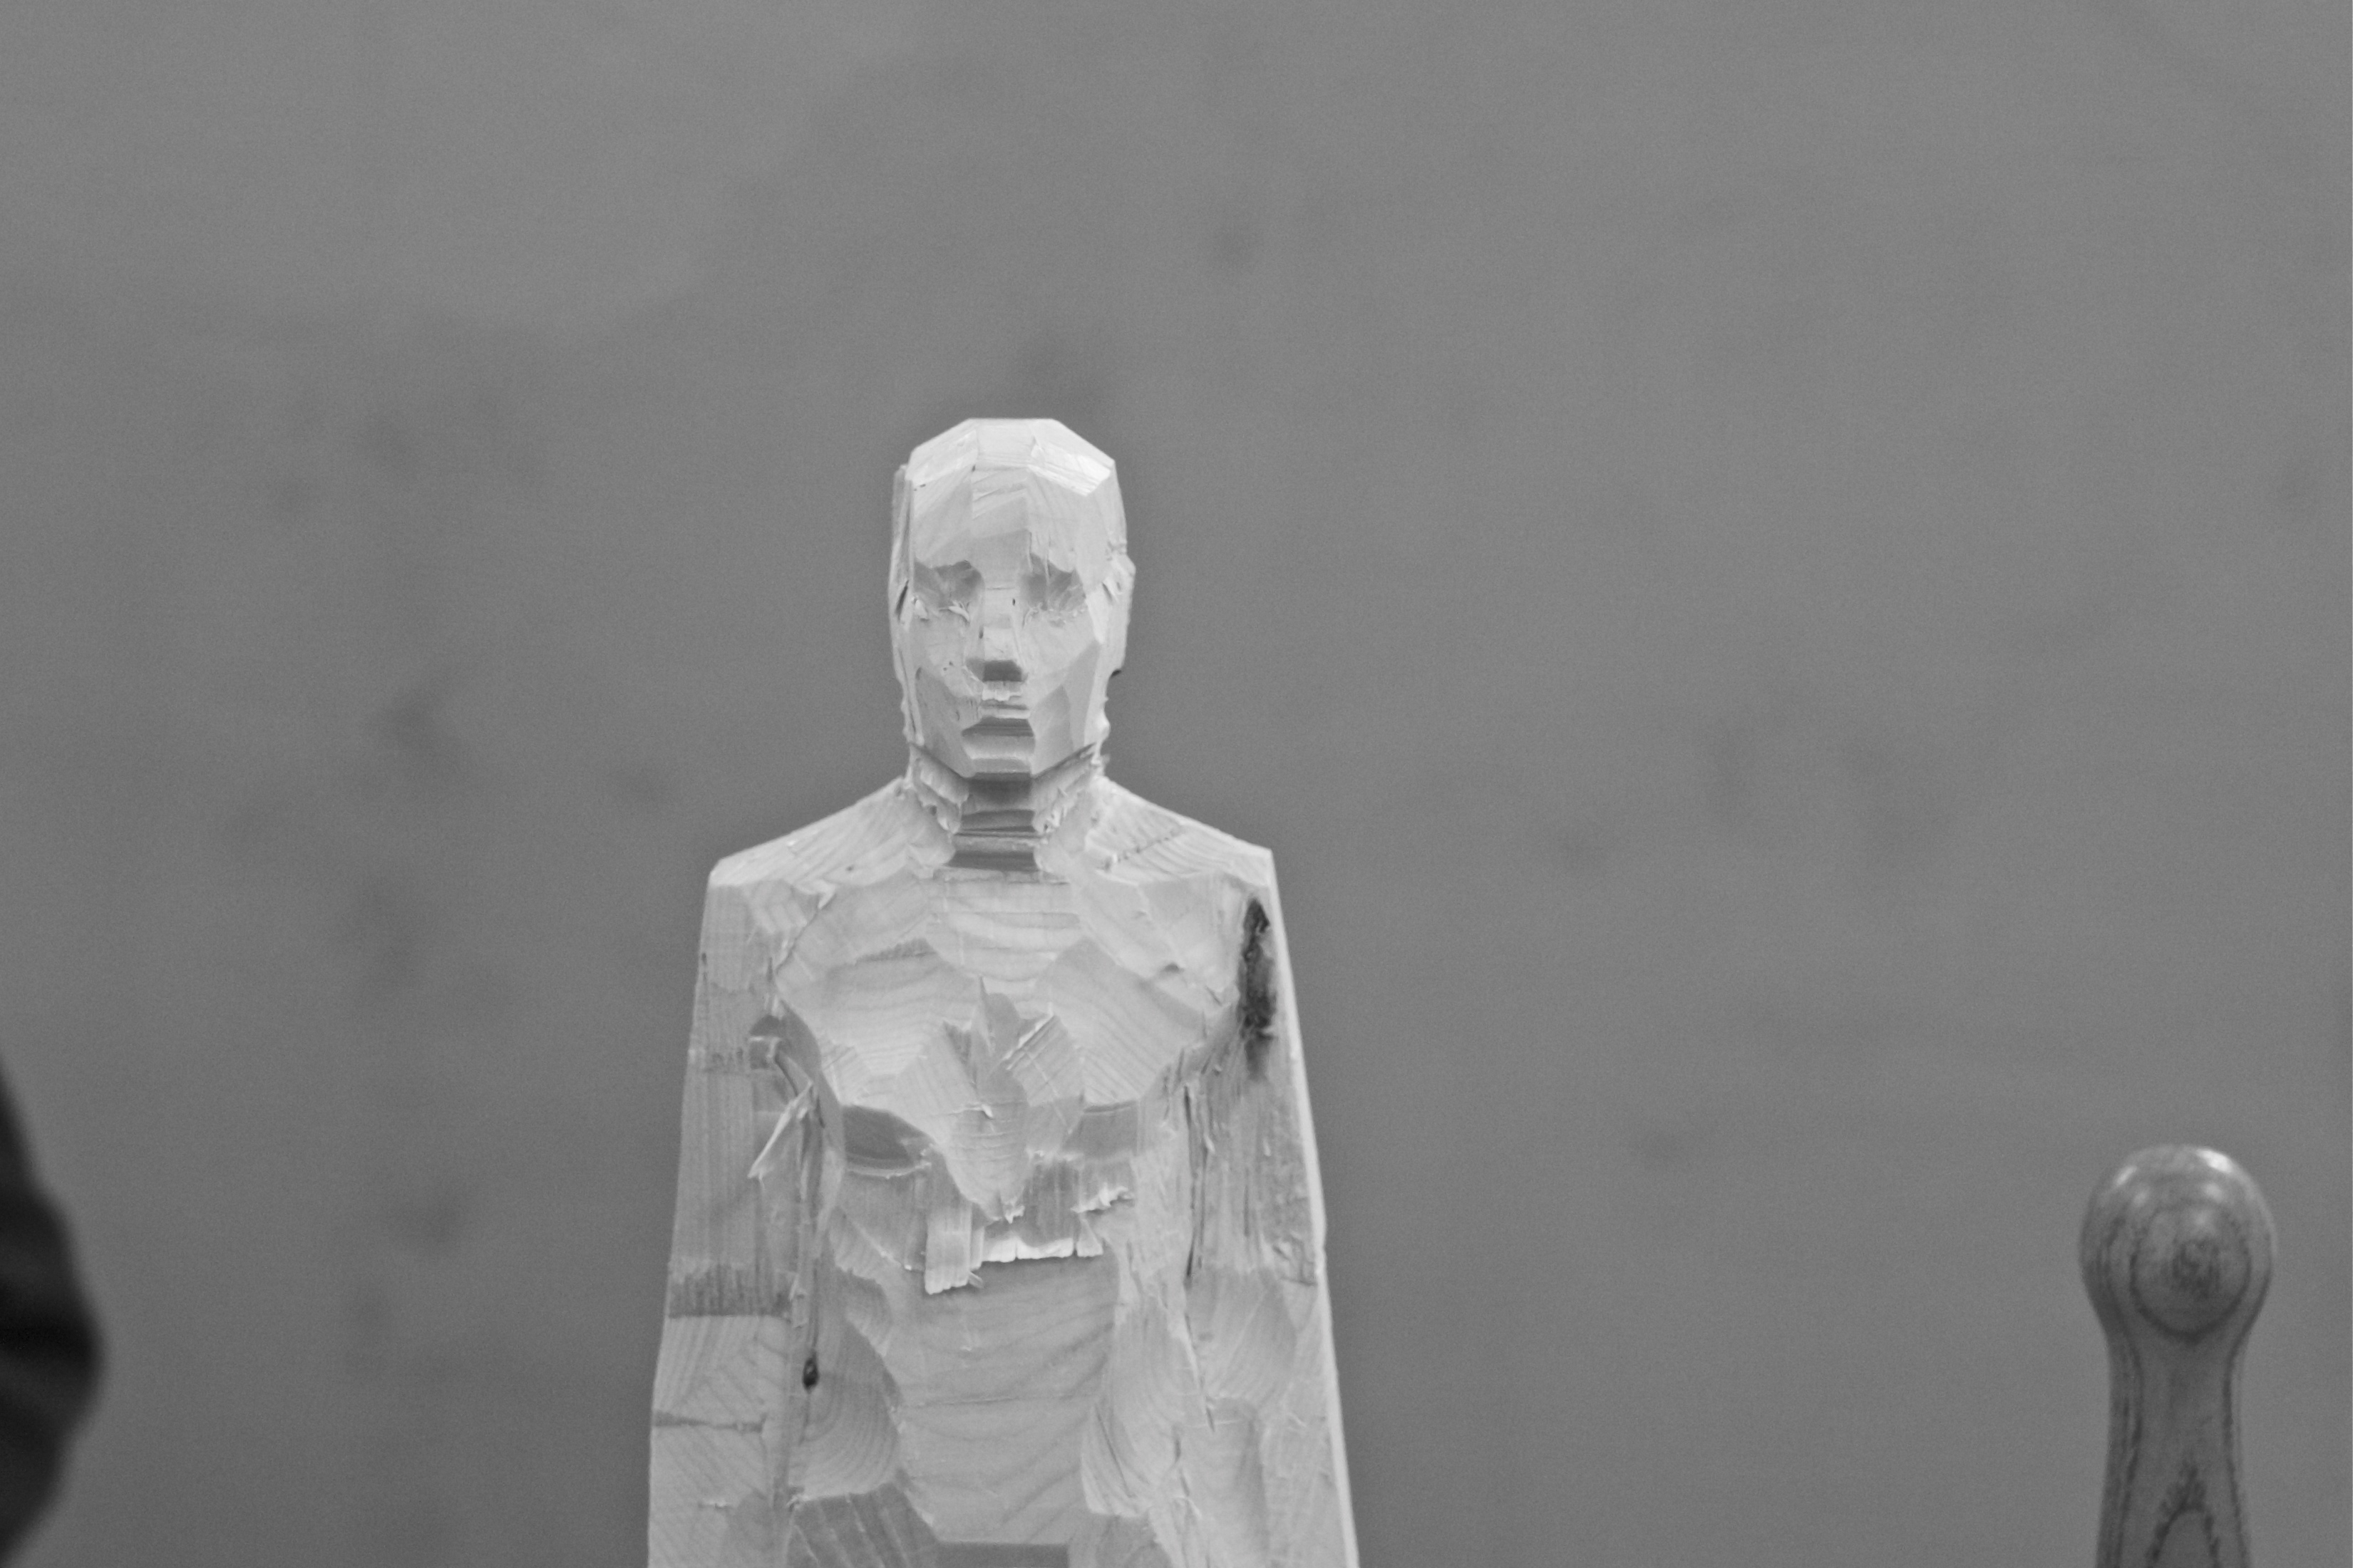 Flickr - Aron Demetz - Dialoghi e materia - Workshop a cura di Franco Reina92